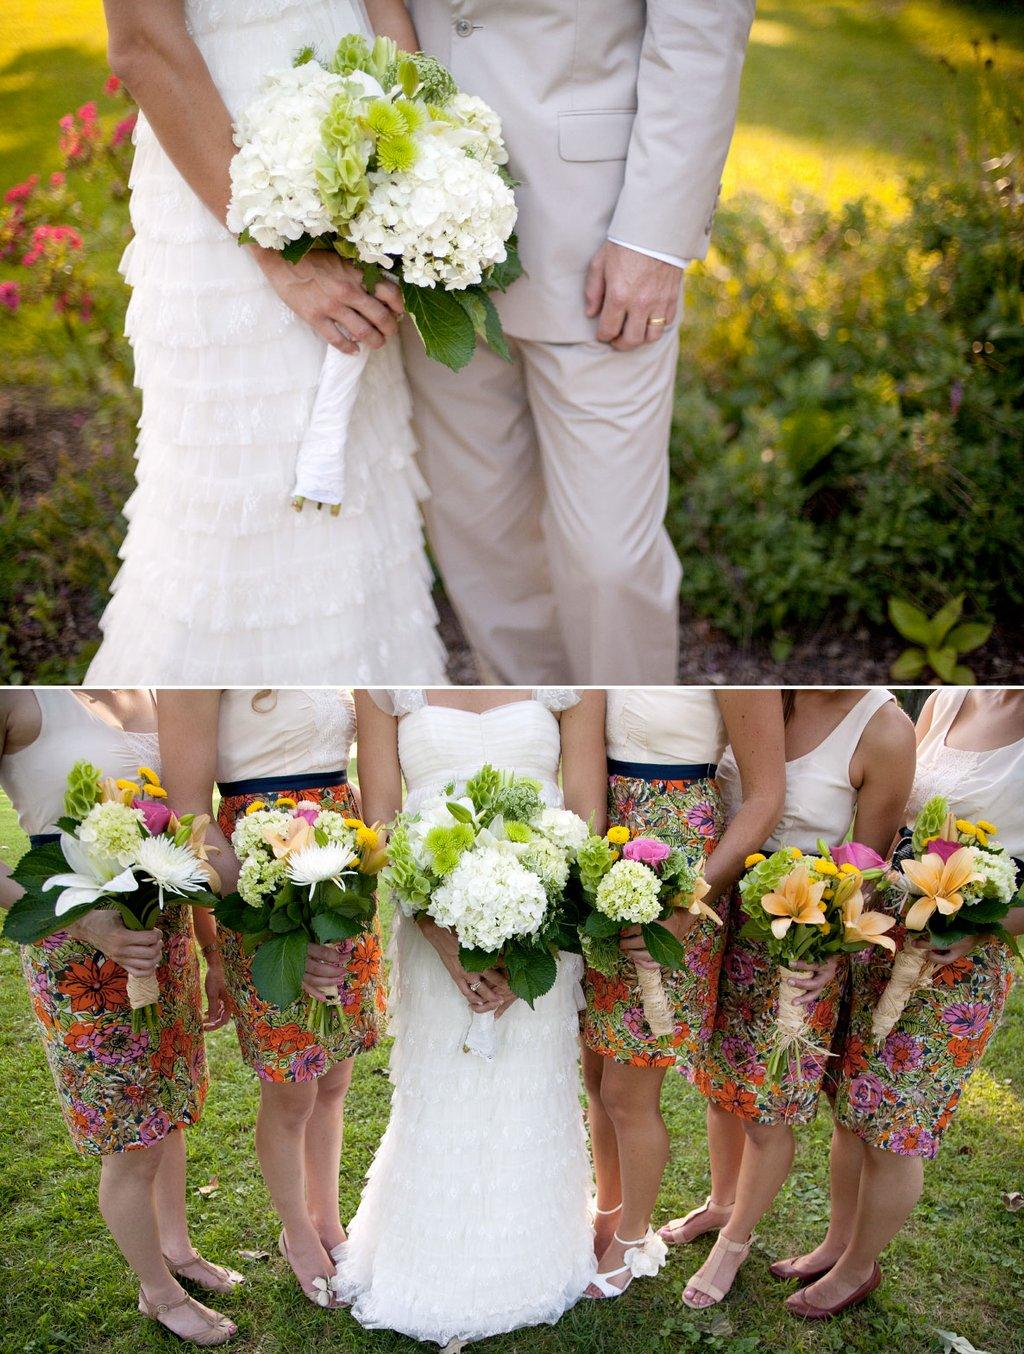 Artistic-wedding-photography-outdoor-venue-white-wedding-dress.full